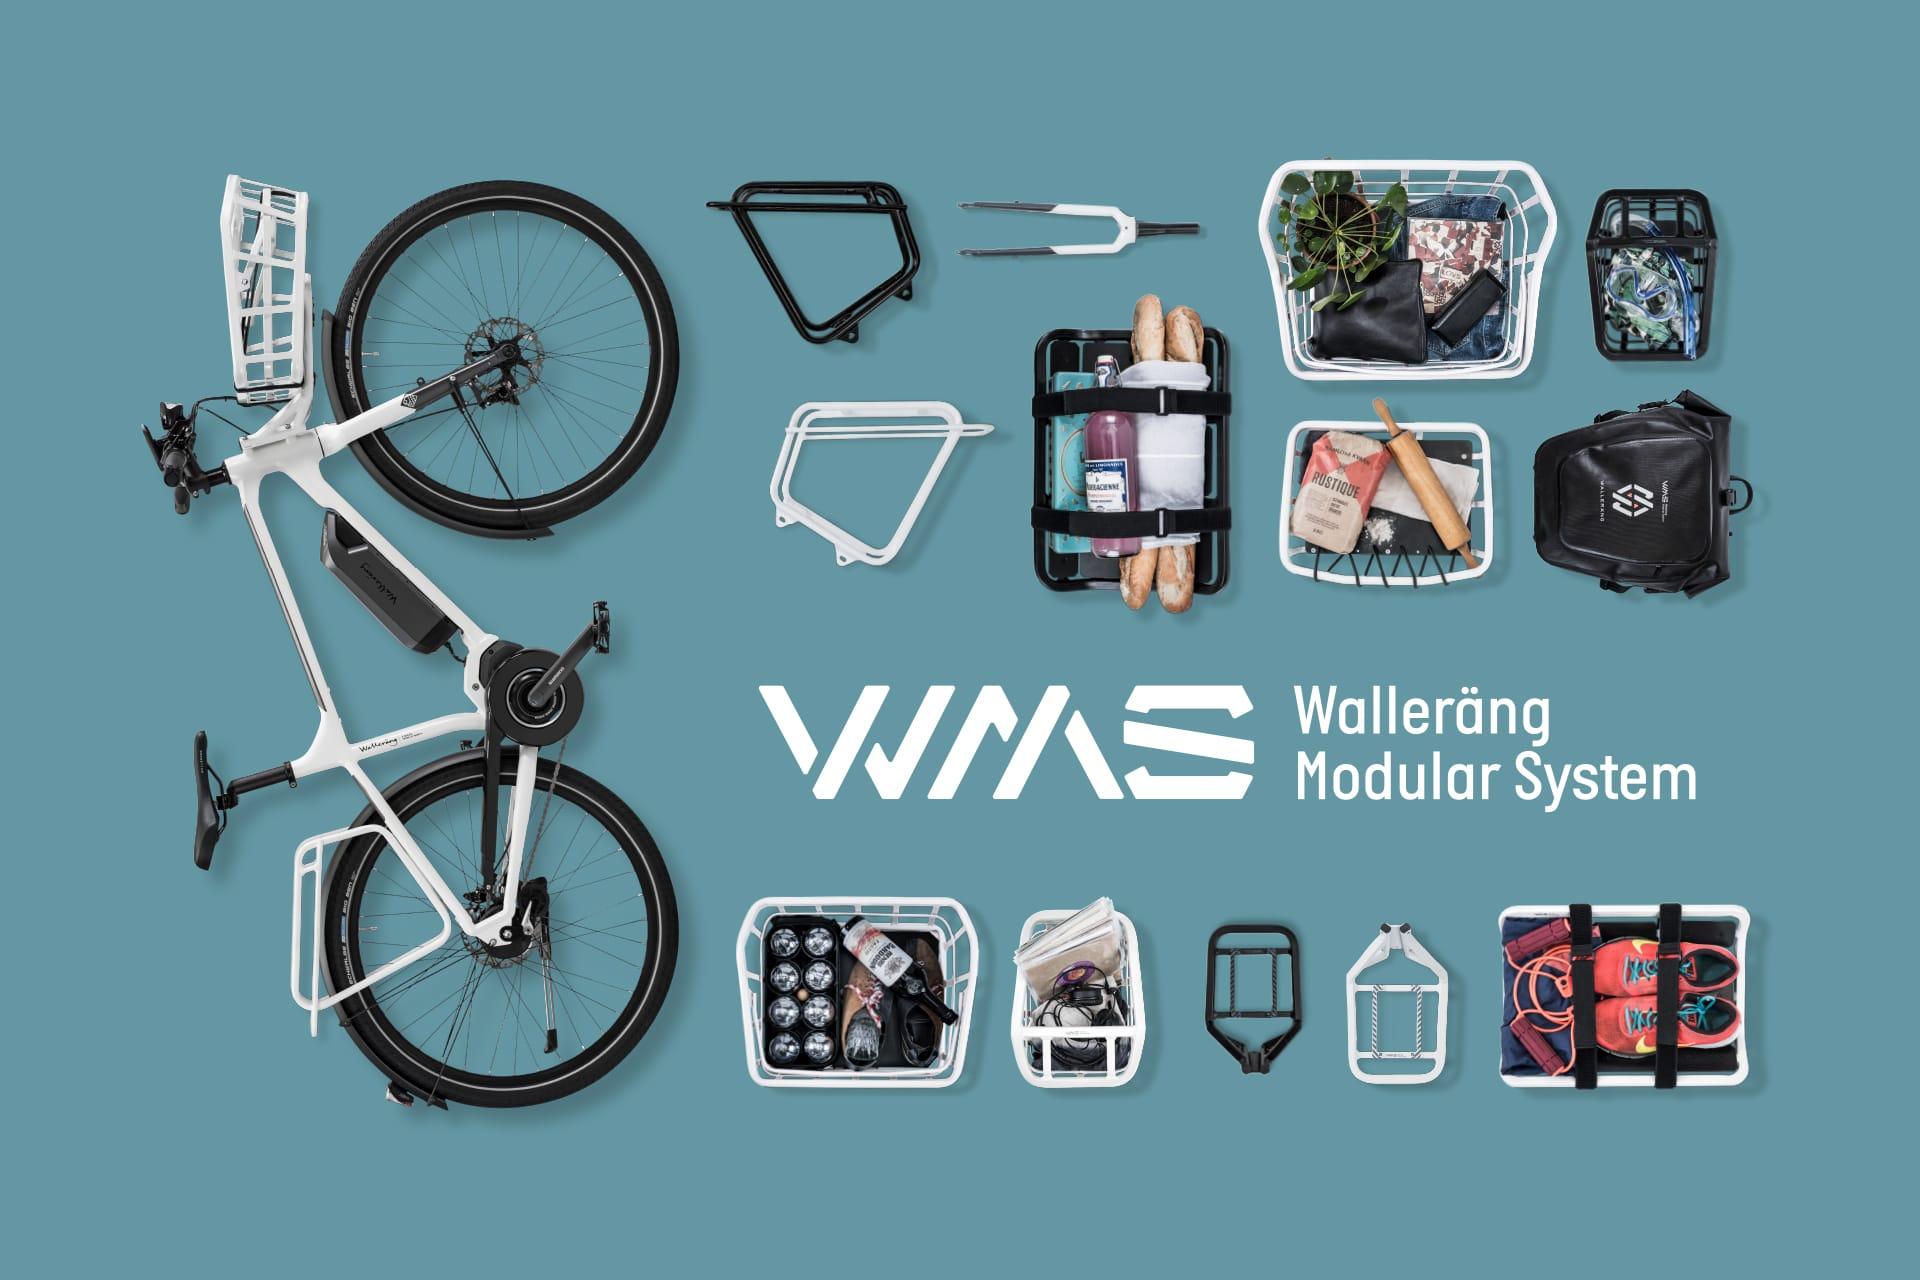 Wallerang_Modular_System_mnecander